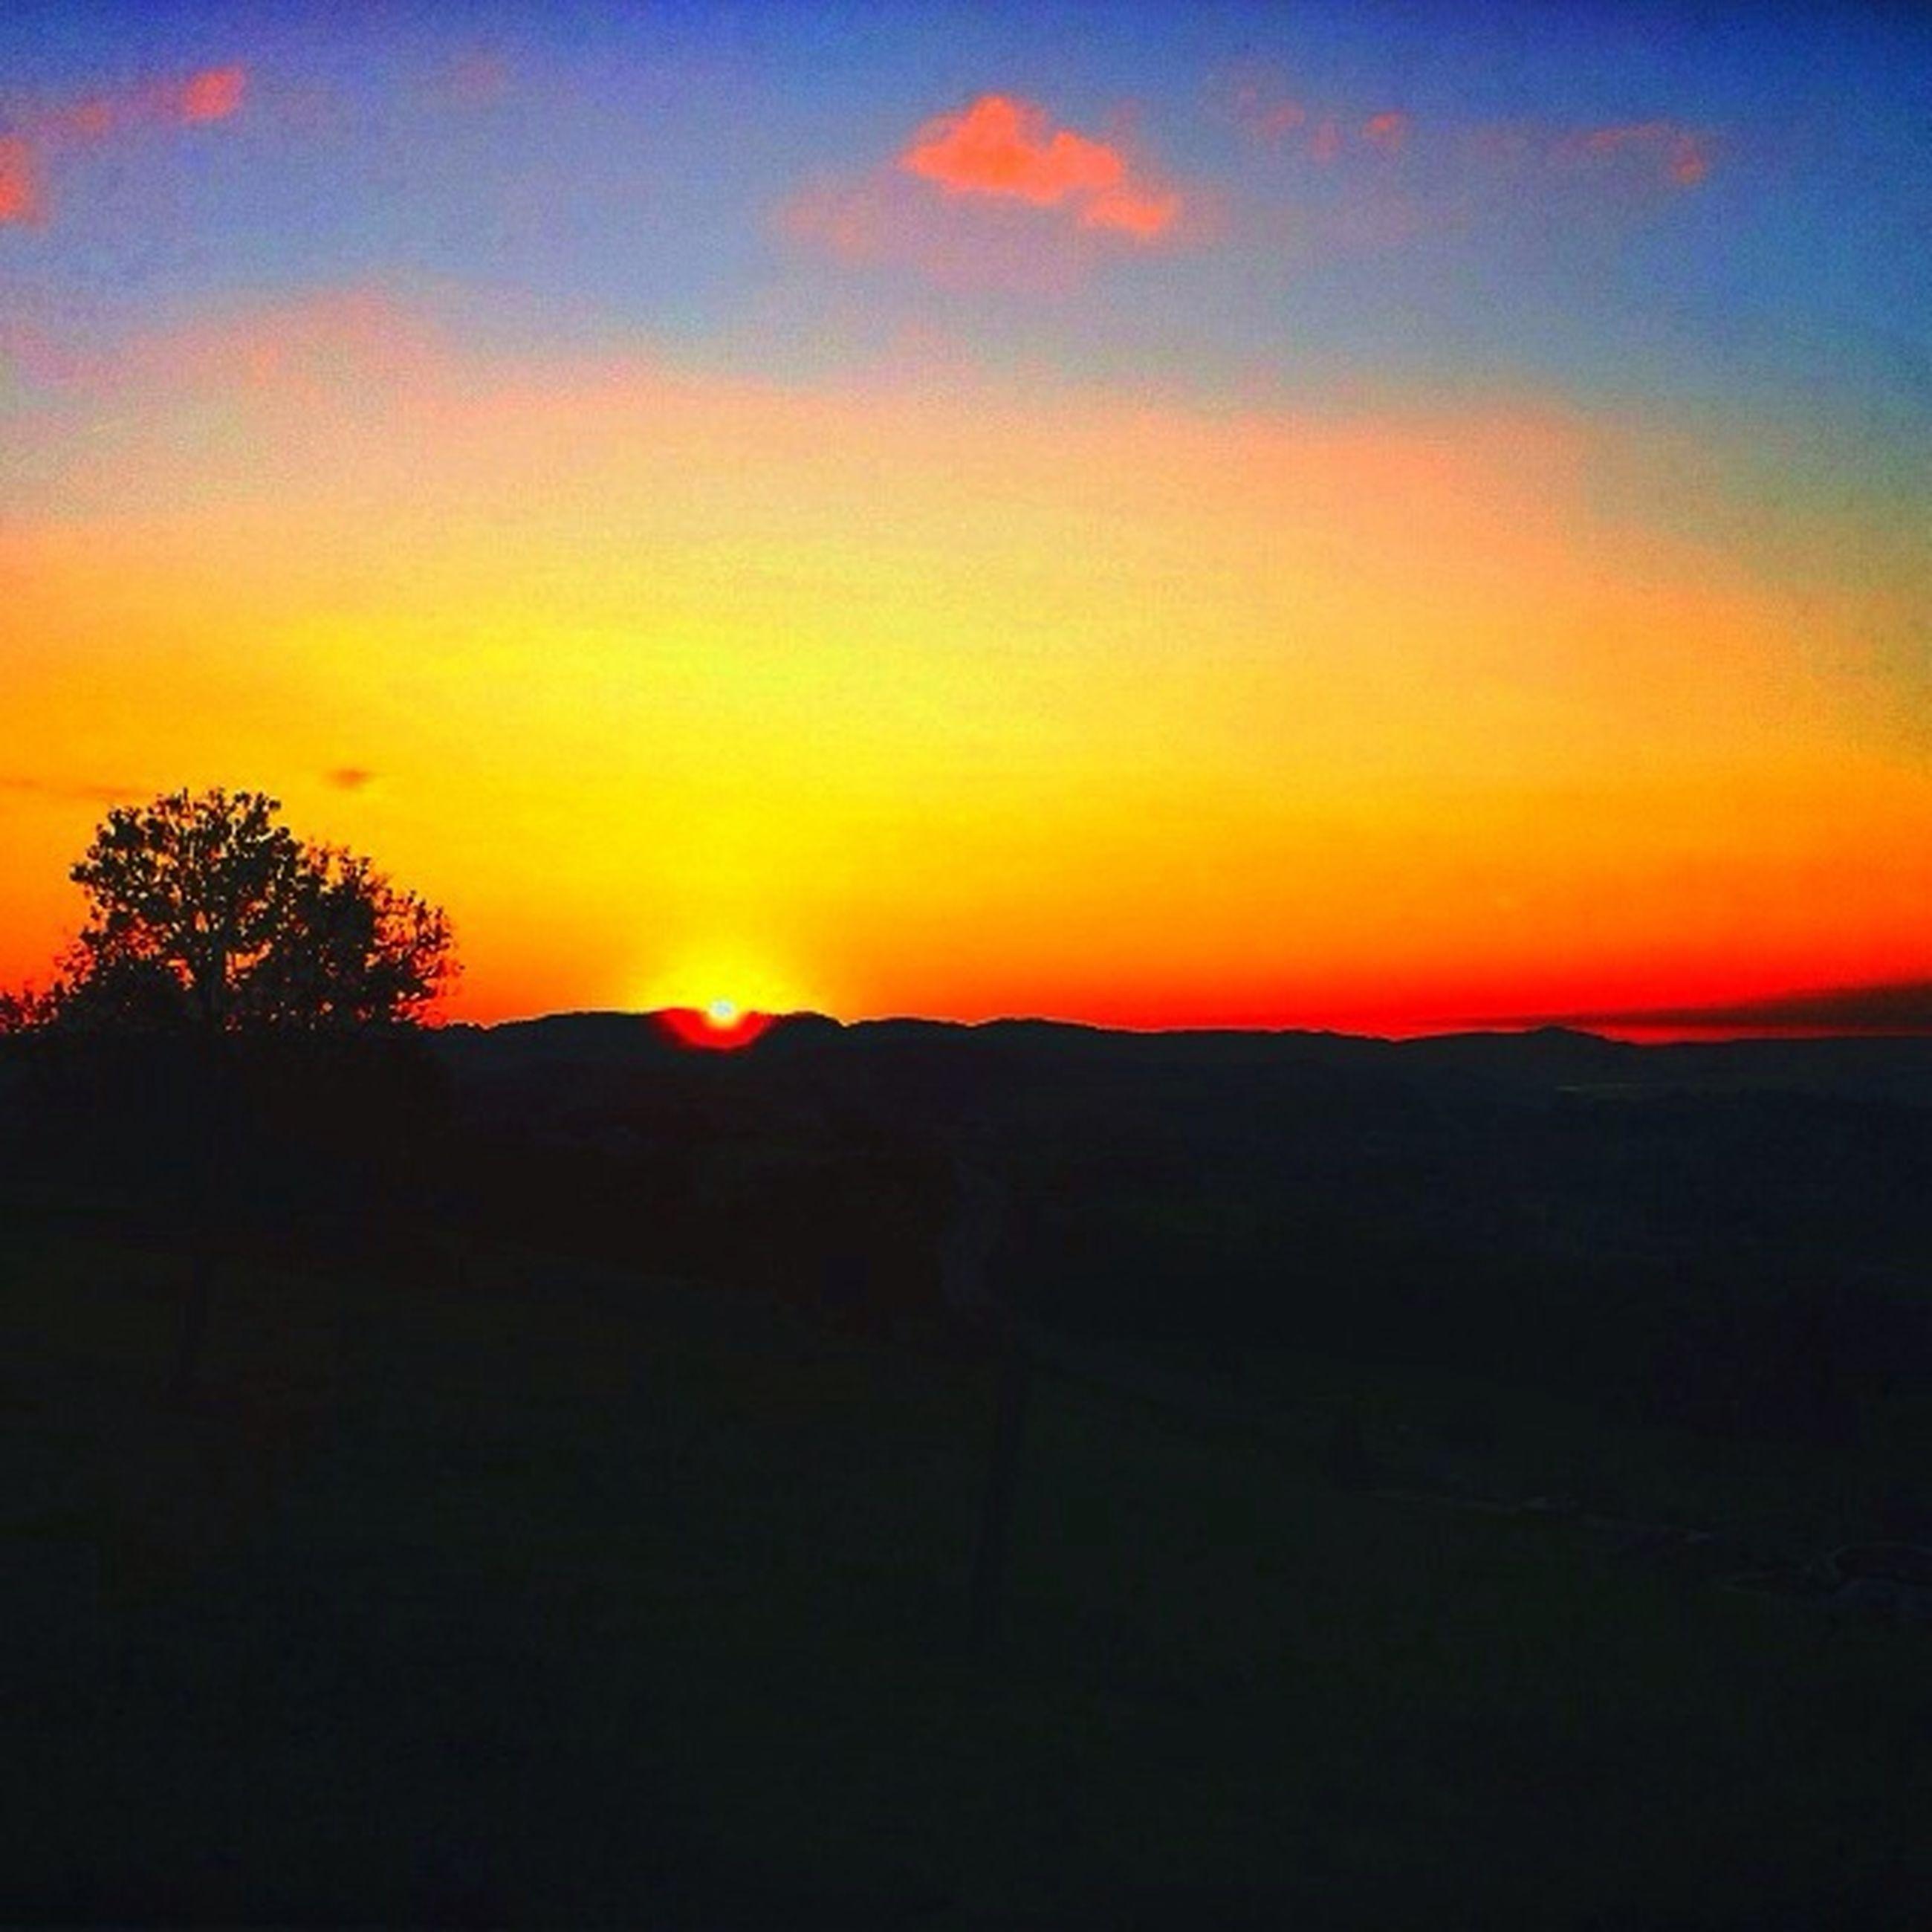 sunset, silhouette, orange color, scenics, tranquil scene, tranquility, beauty in nature, landscape, sky, idyllic, nature, sun, dark, copy space, tree, majestic, dramatic sky, non-urban scene, outdoors, no people